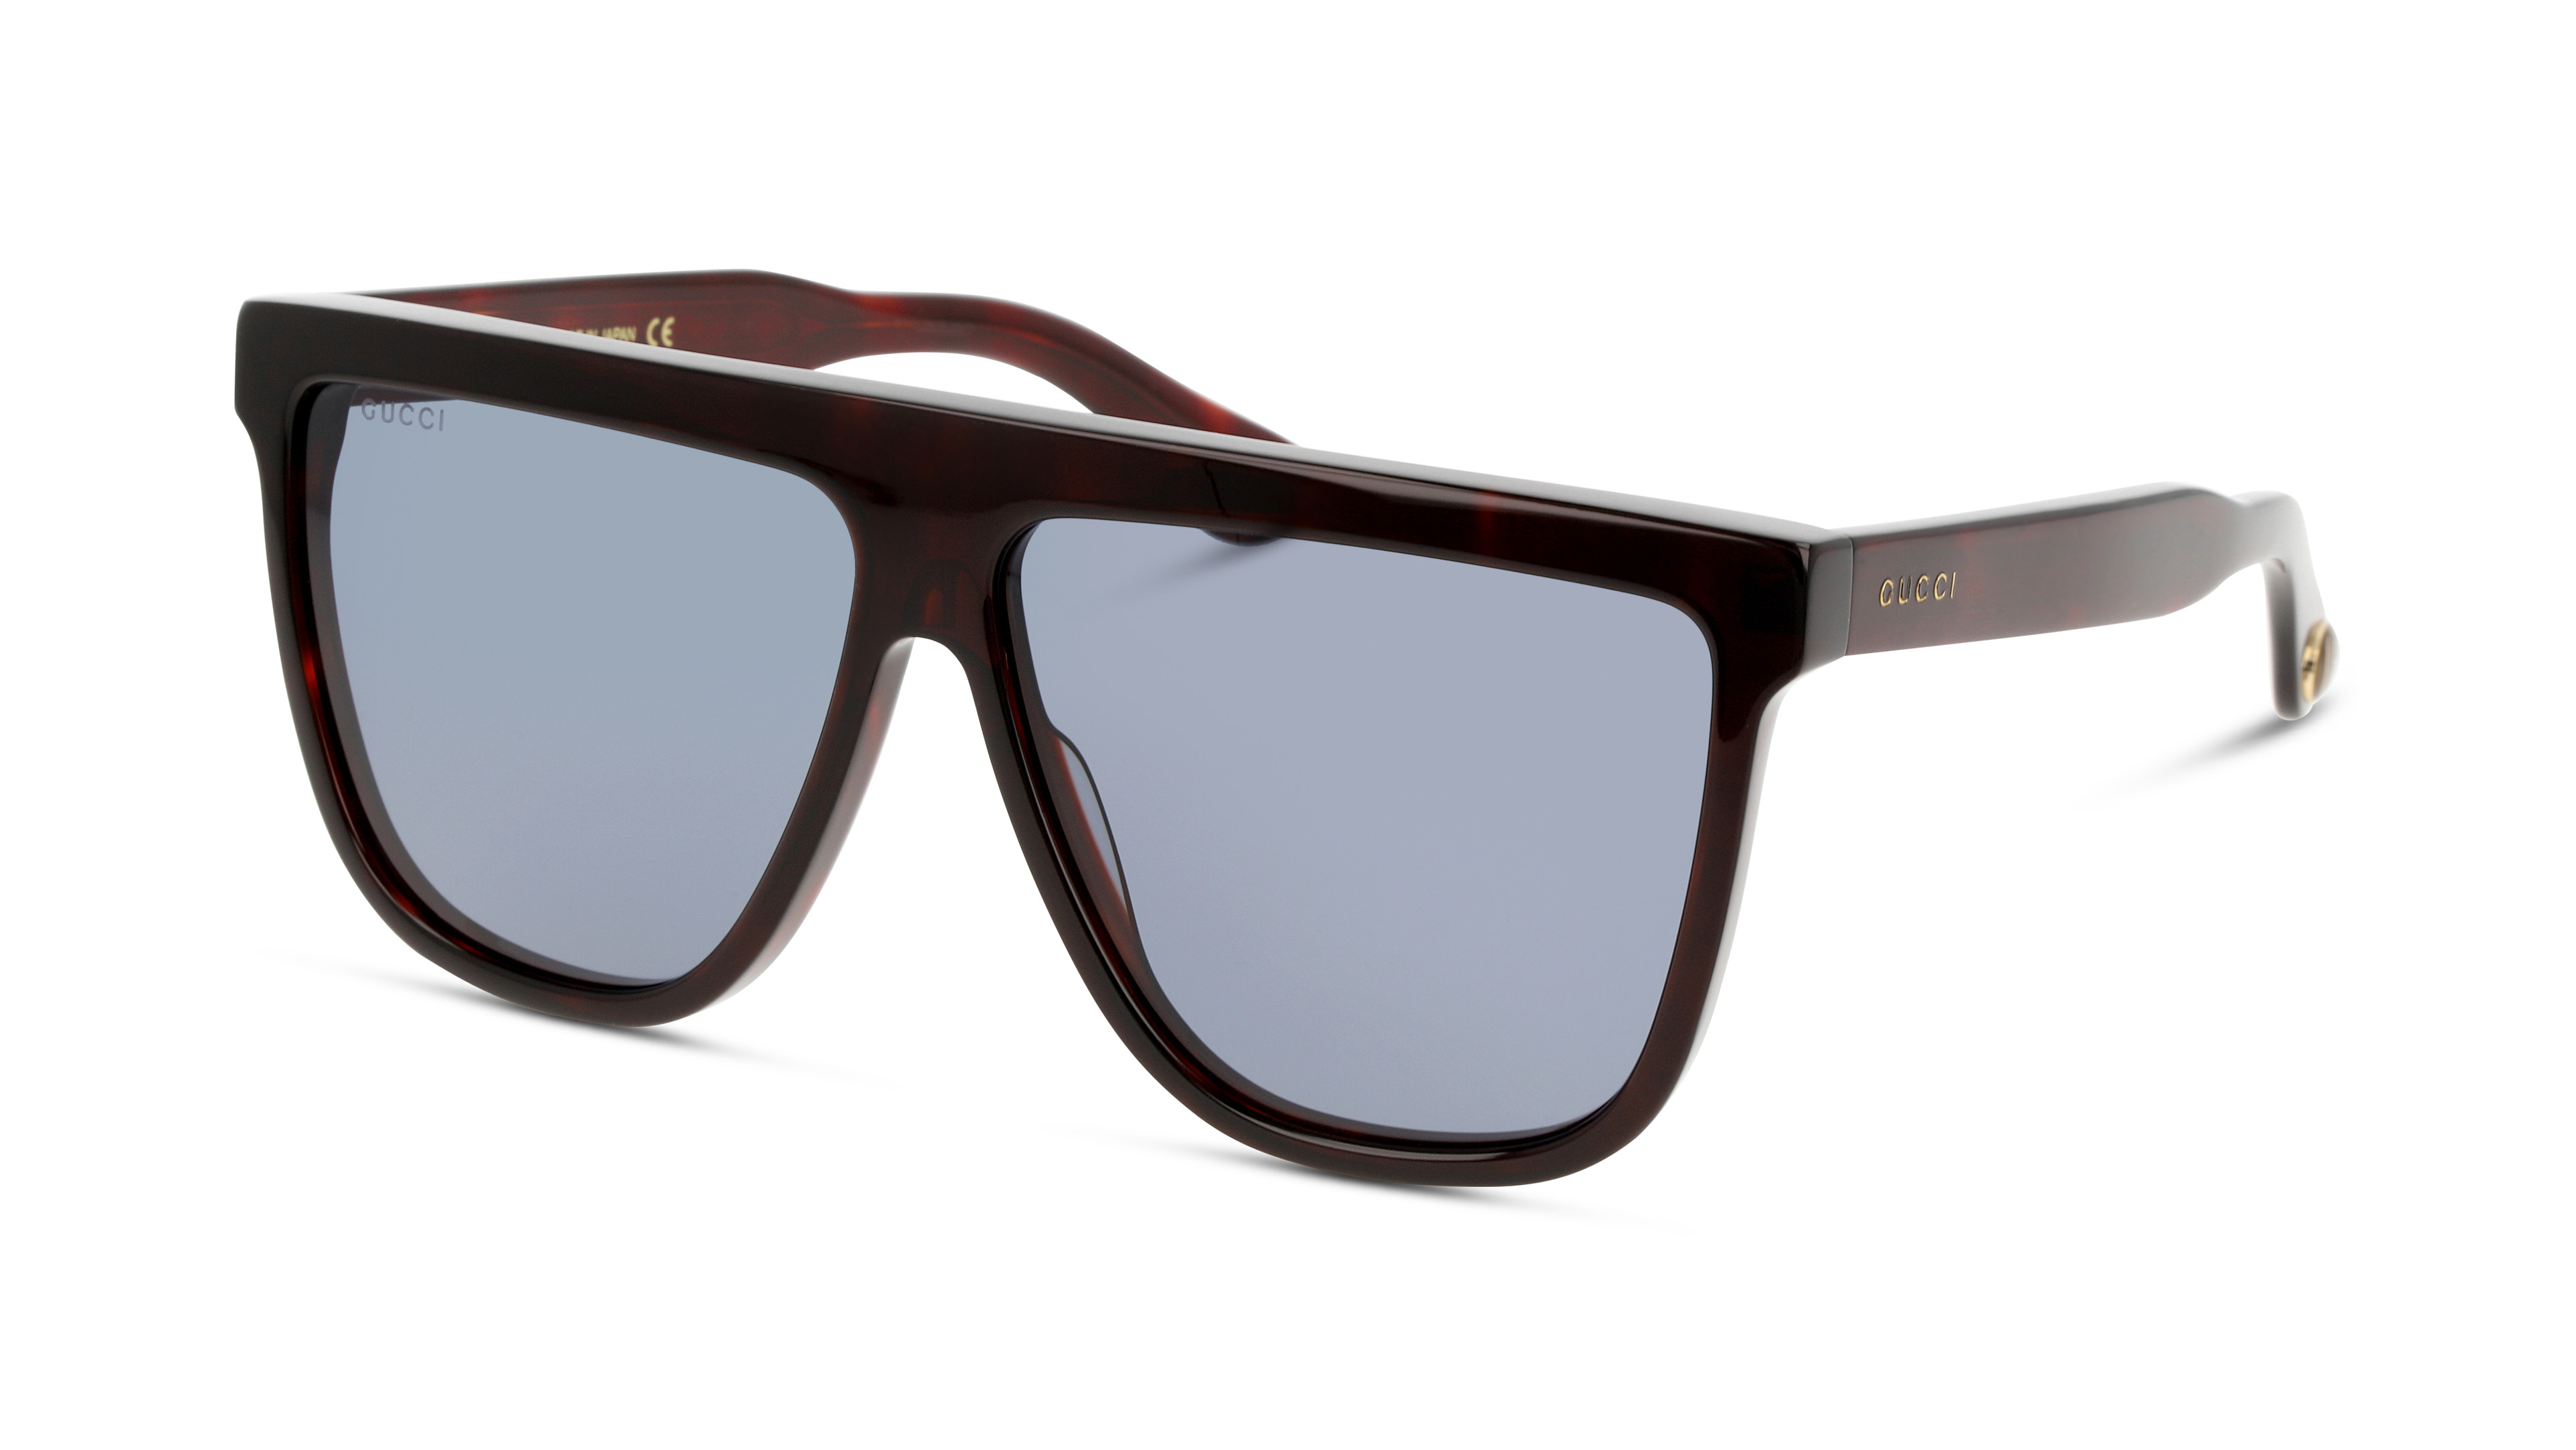 8056376282368-angle-03-gucci-gg0582s-eyewear-havana-havana-blue